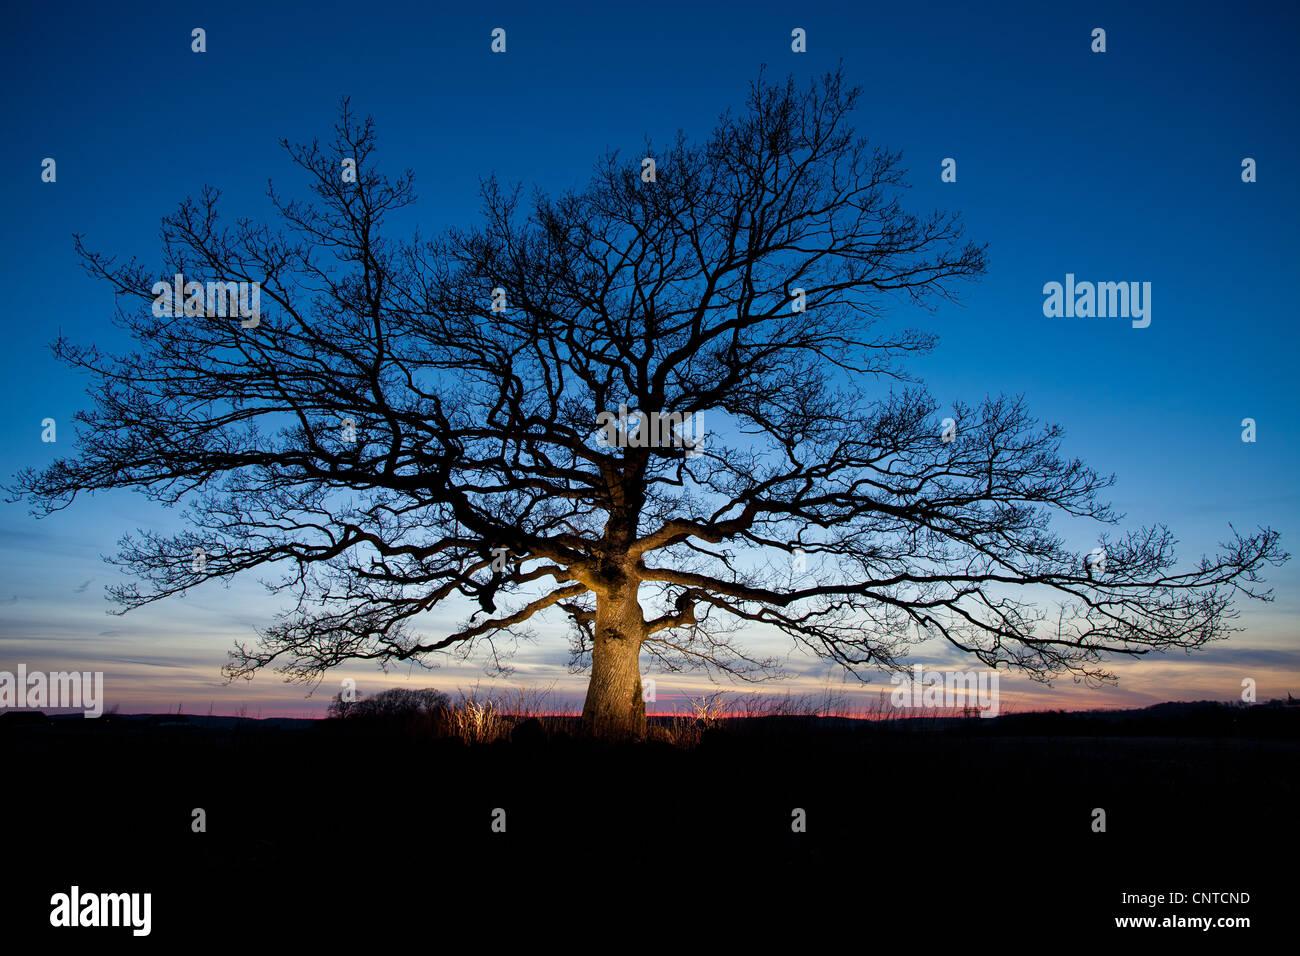 Beautiful oak tree at dusk in Råde, Østfold fylke, Norway. - Stock Image